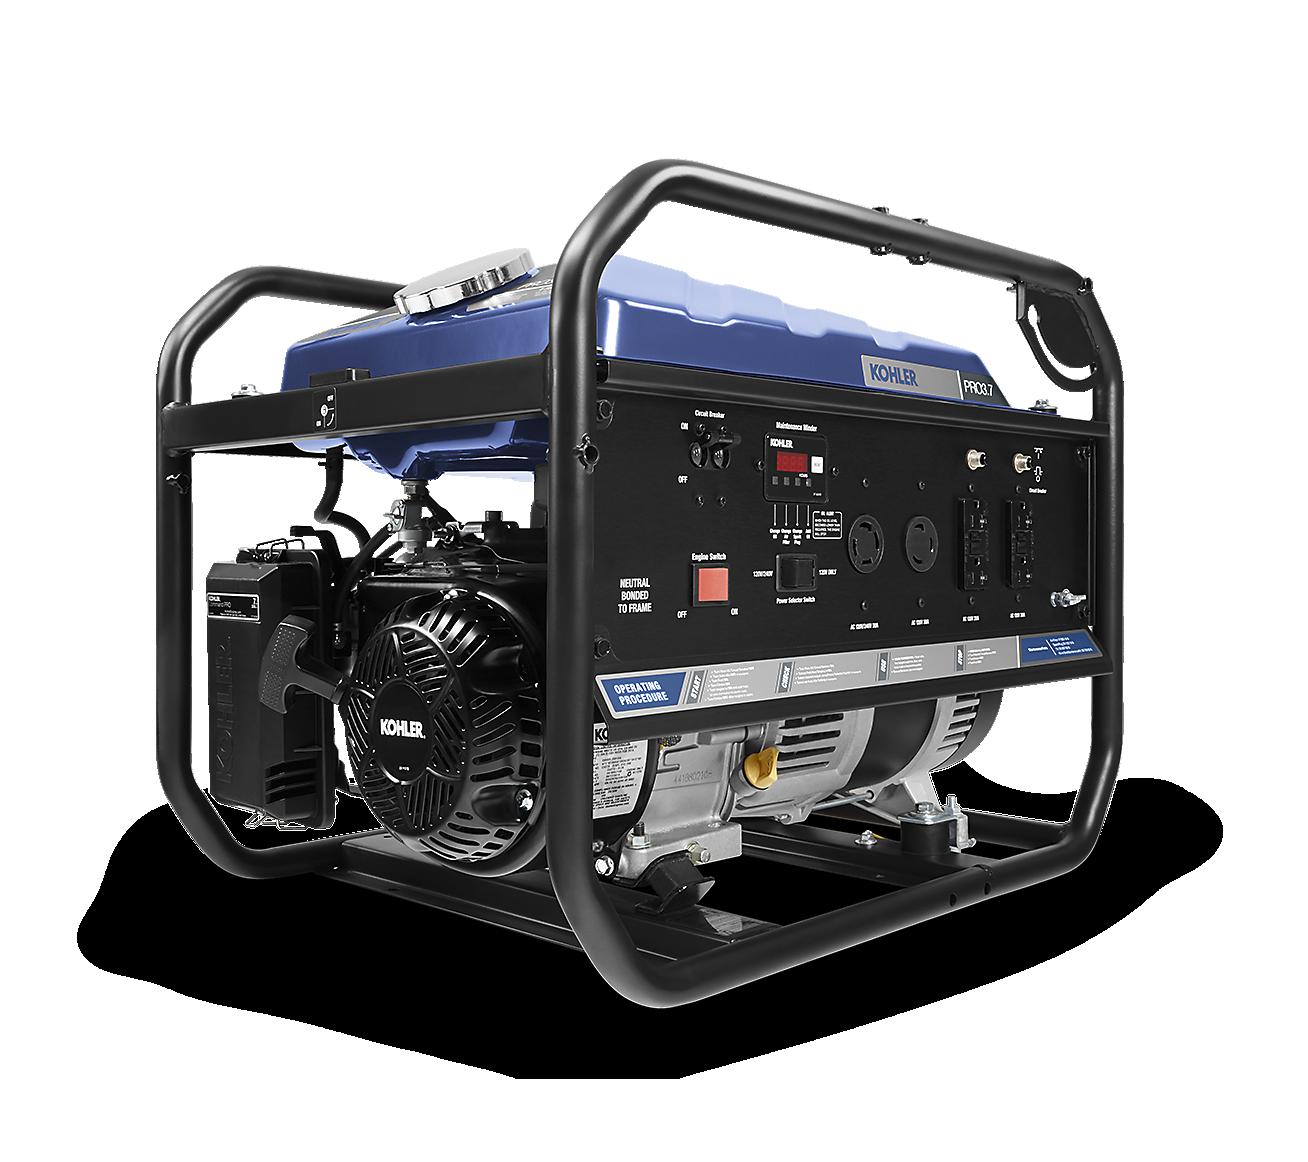 KOHLER Generators | Generators 101 | What's a Standby Home